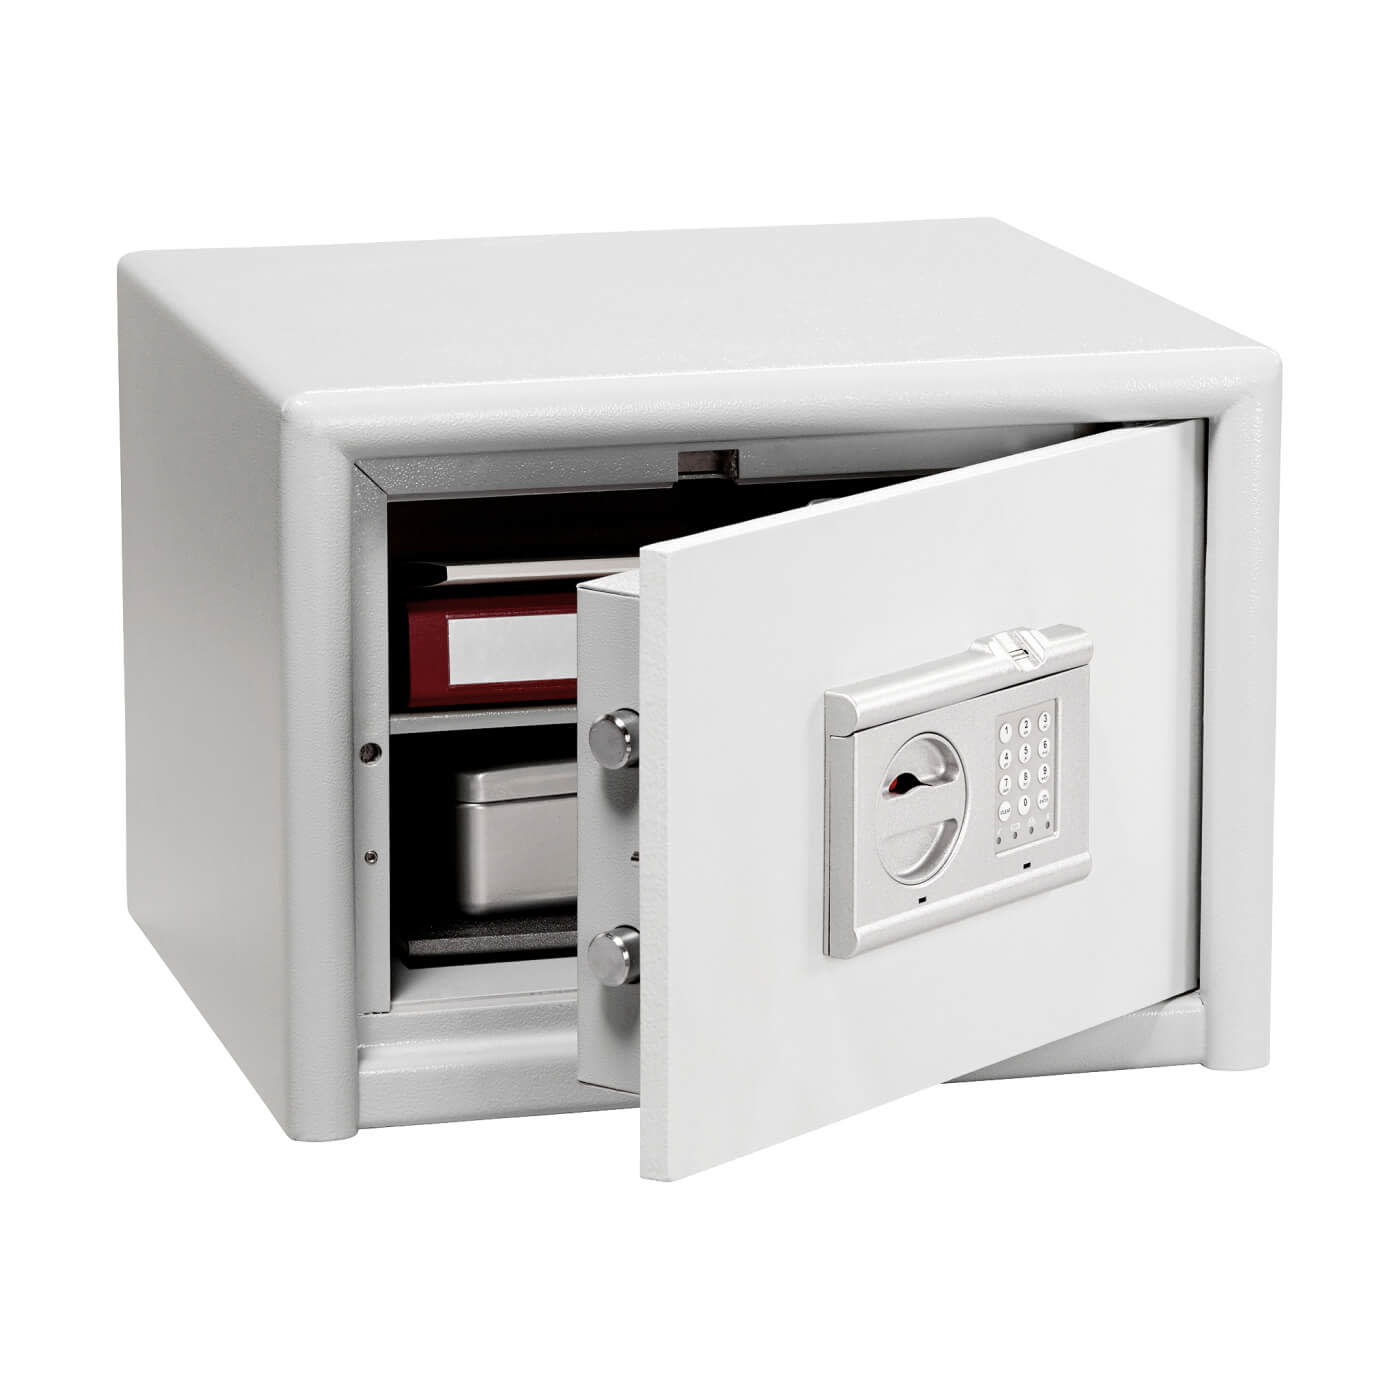 Burg Wächter CL 20 E FS Combi-Line Electronic Biometric Fire Safe - 360 x 495 x 445mm - Light Grey)